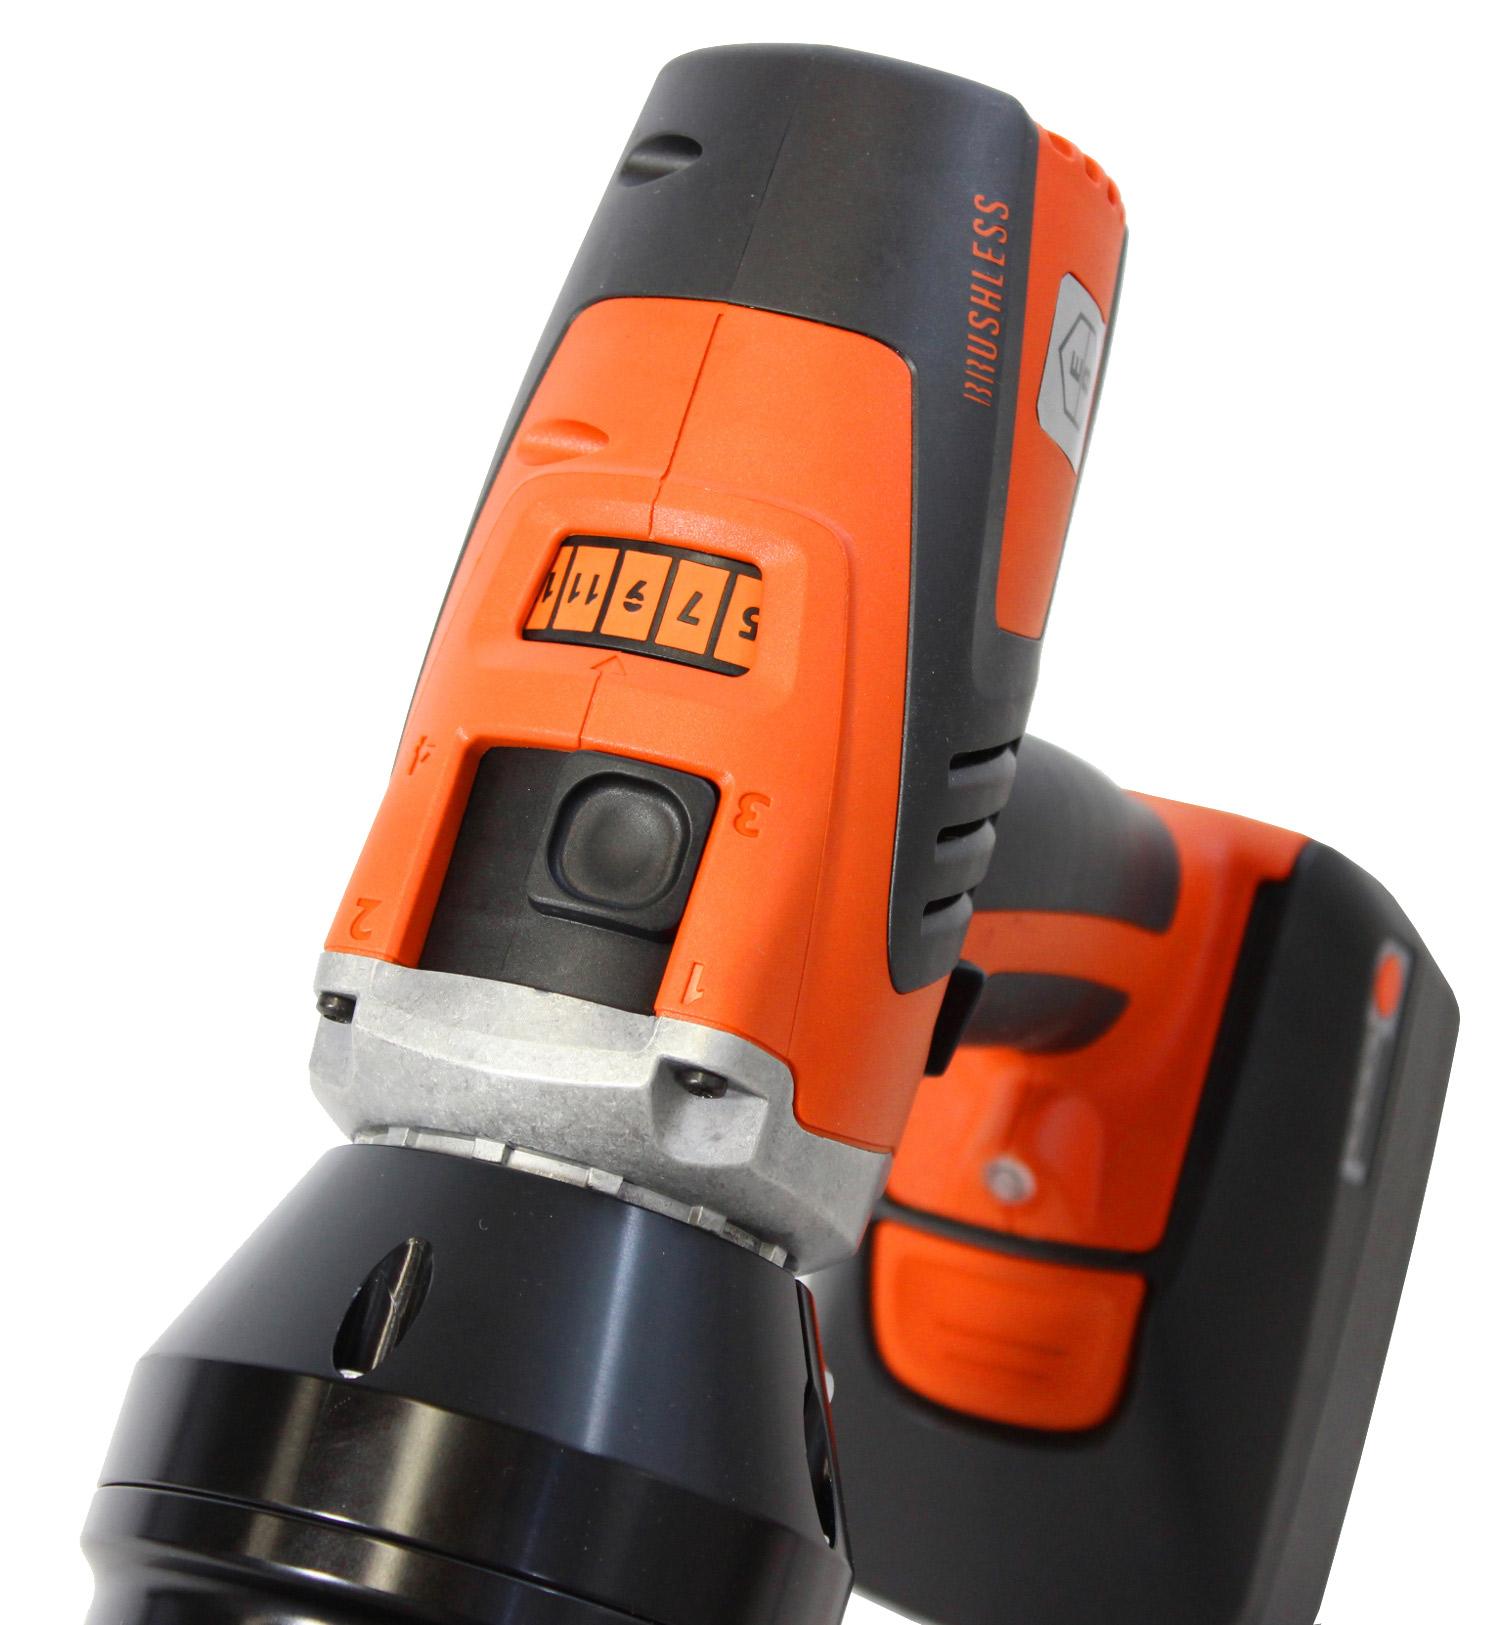 Juwel Torque Wrench >> Cordless Torque Wrench, Battery Powered Torque Wrench - Electric Torque Wrenches